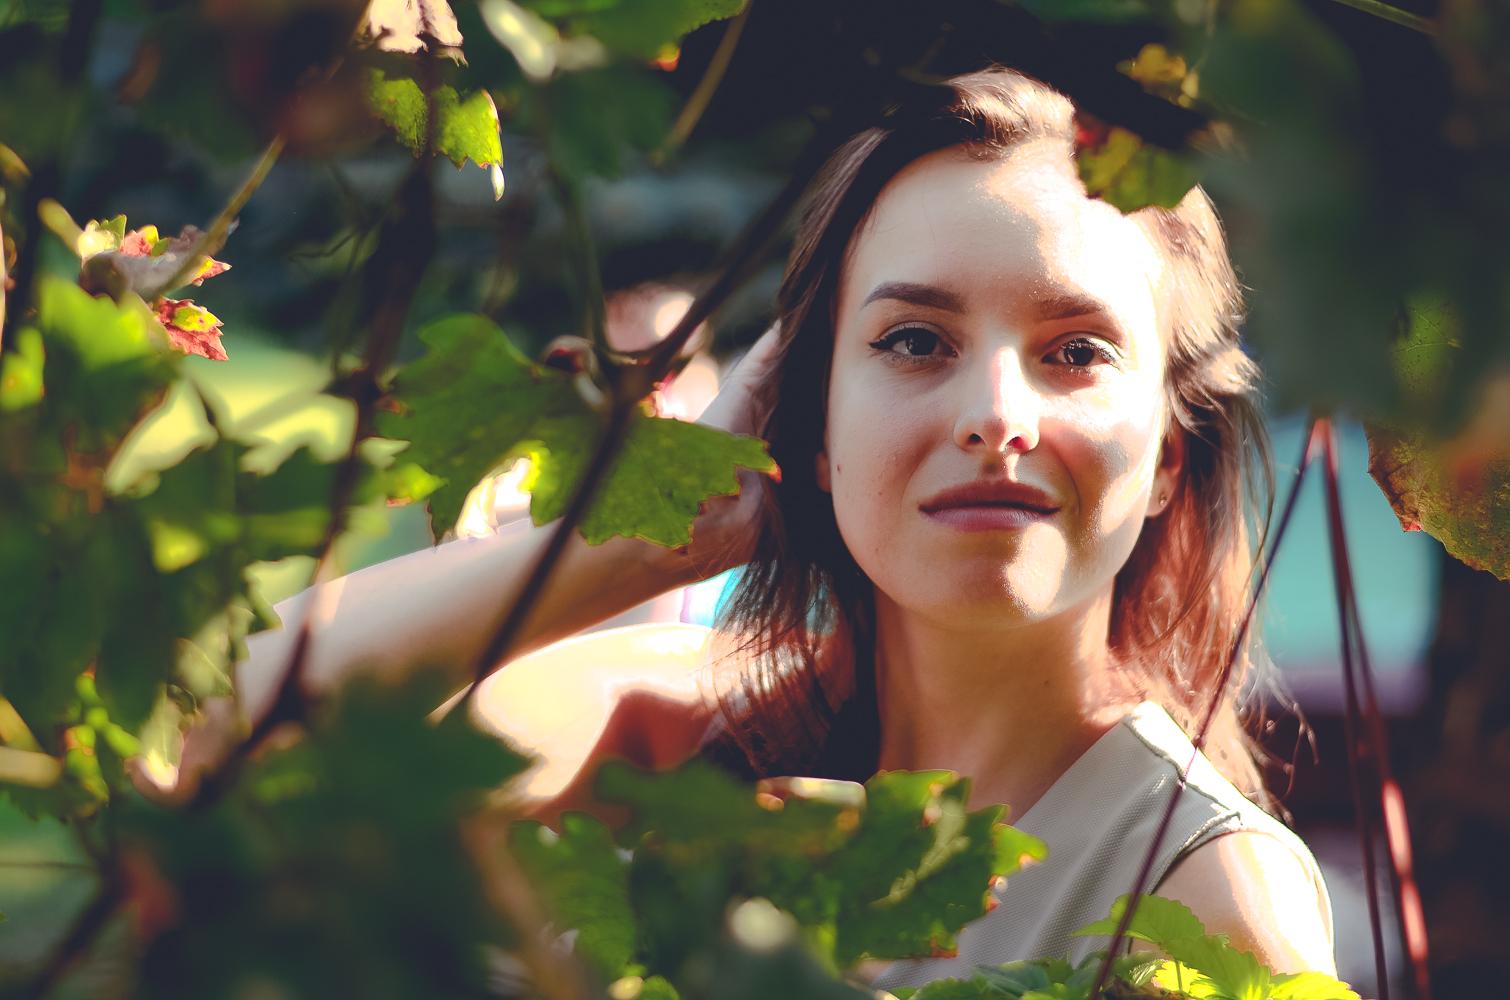 makijaż naturalny kobieta brunetka blog